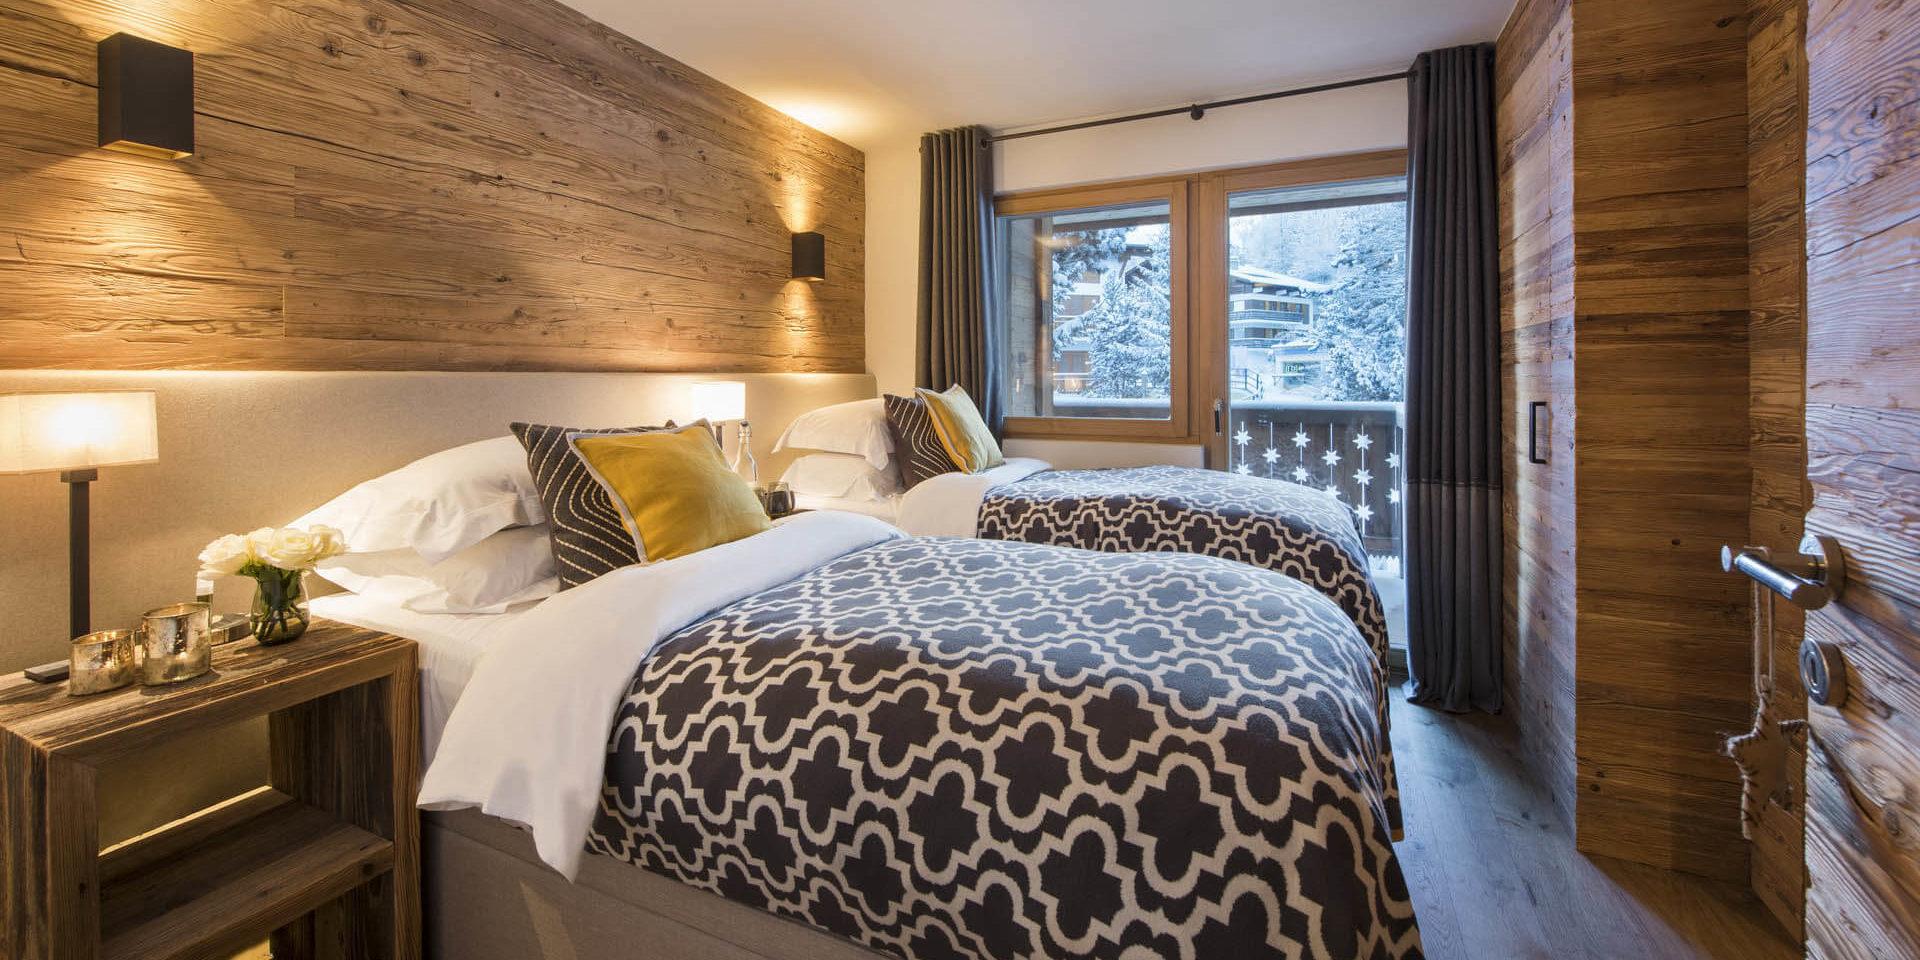 Appartement Rosalp 4 Verbier Les 4 Vallees Zwitserland wintersport skivakantie luxe slaapkamer aparte bedden sprei gele kussens hout balkon besneeuwde bomen